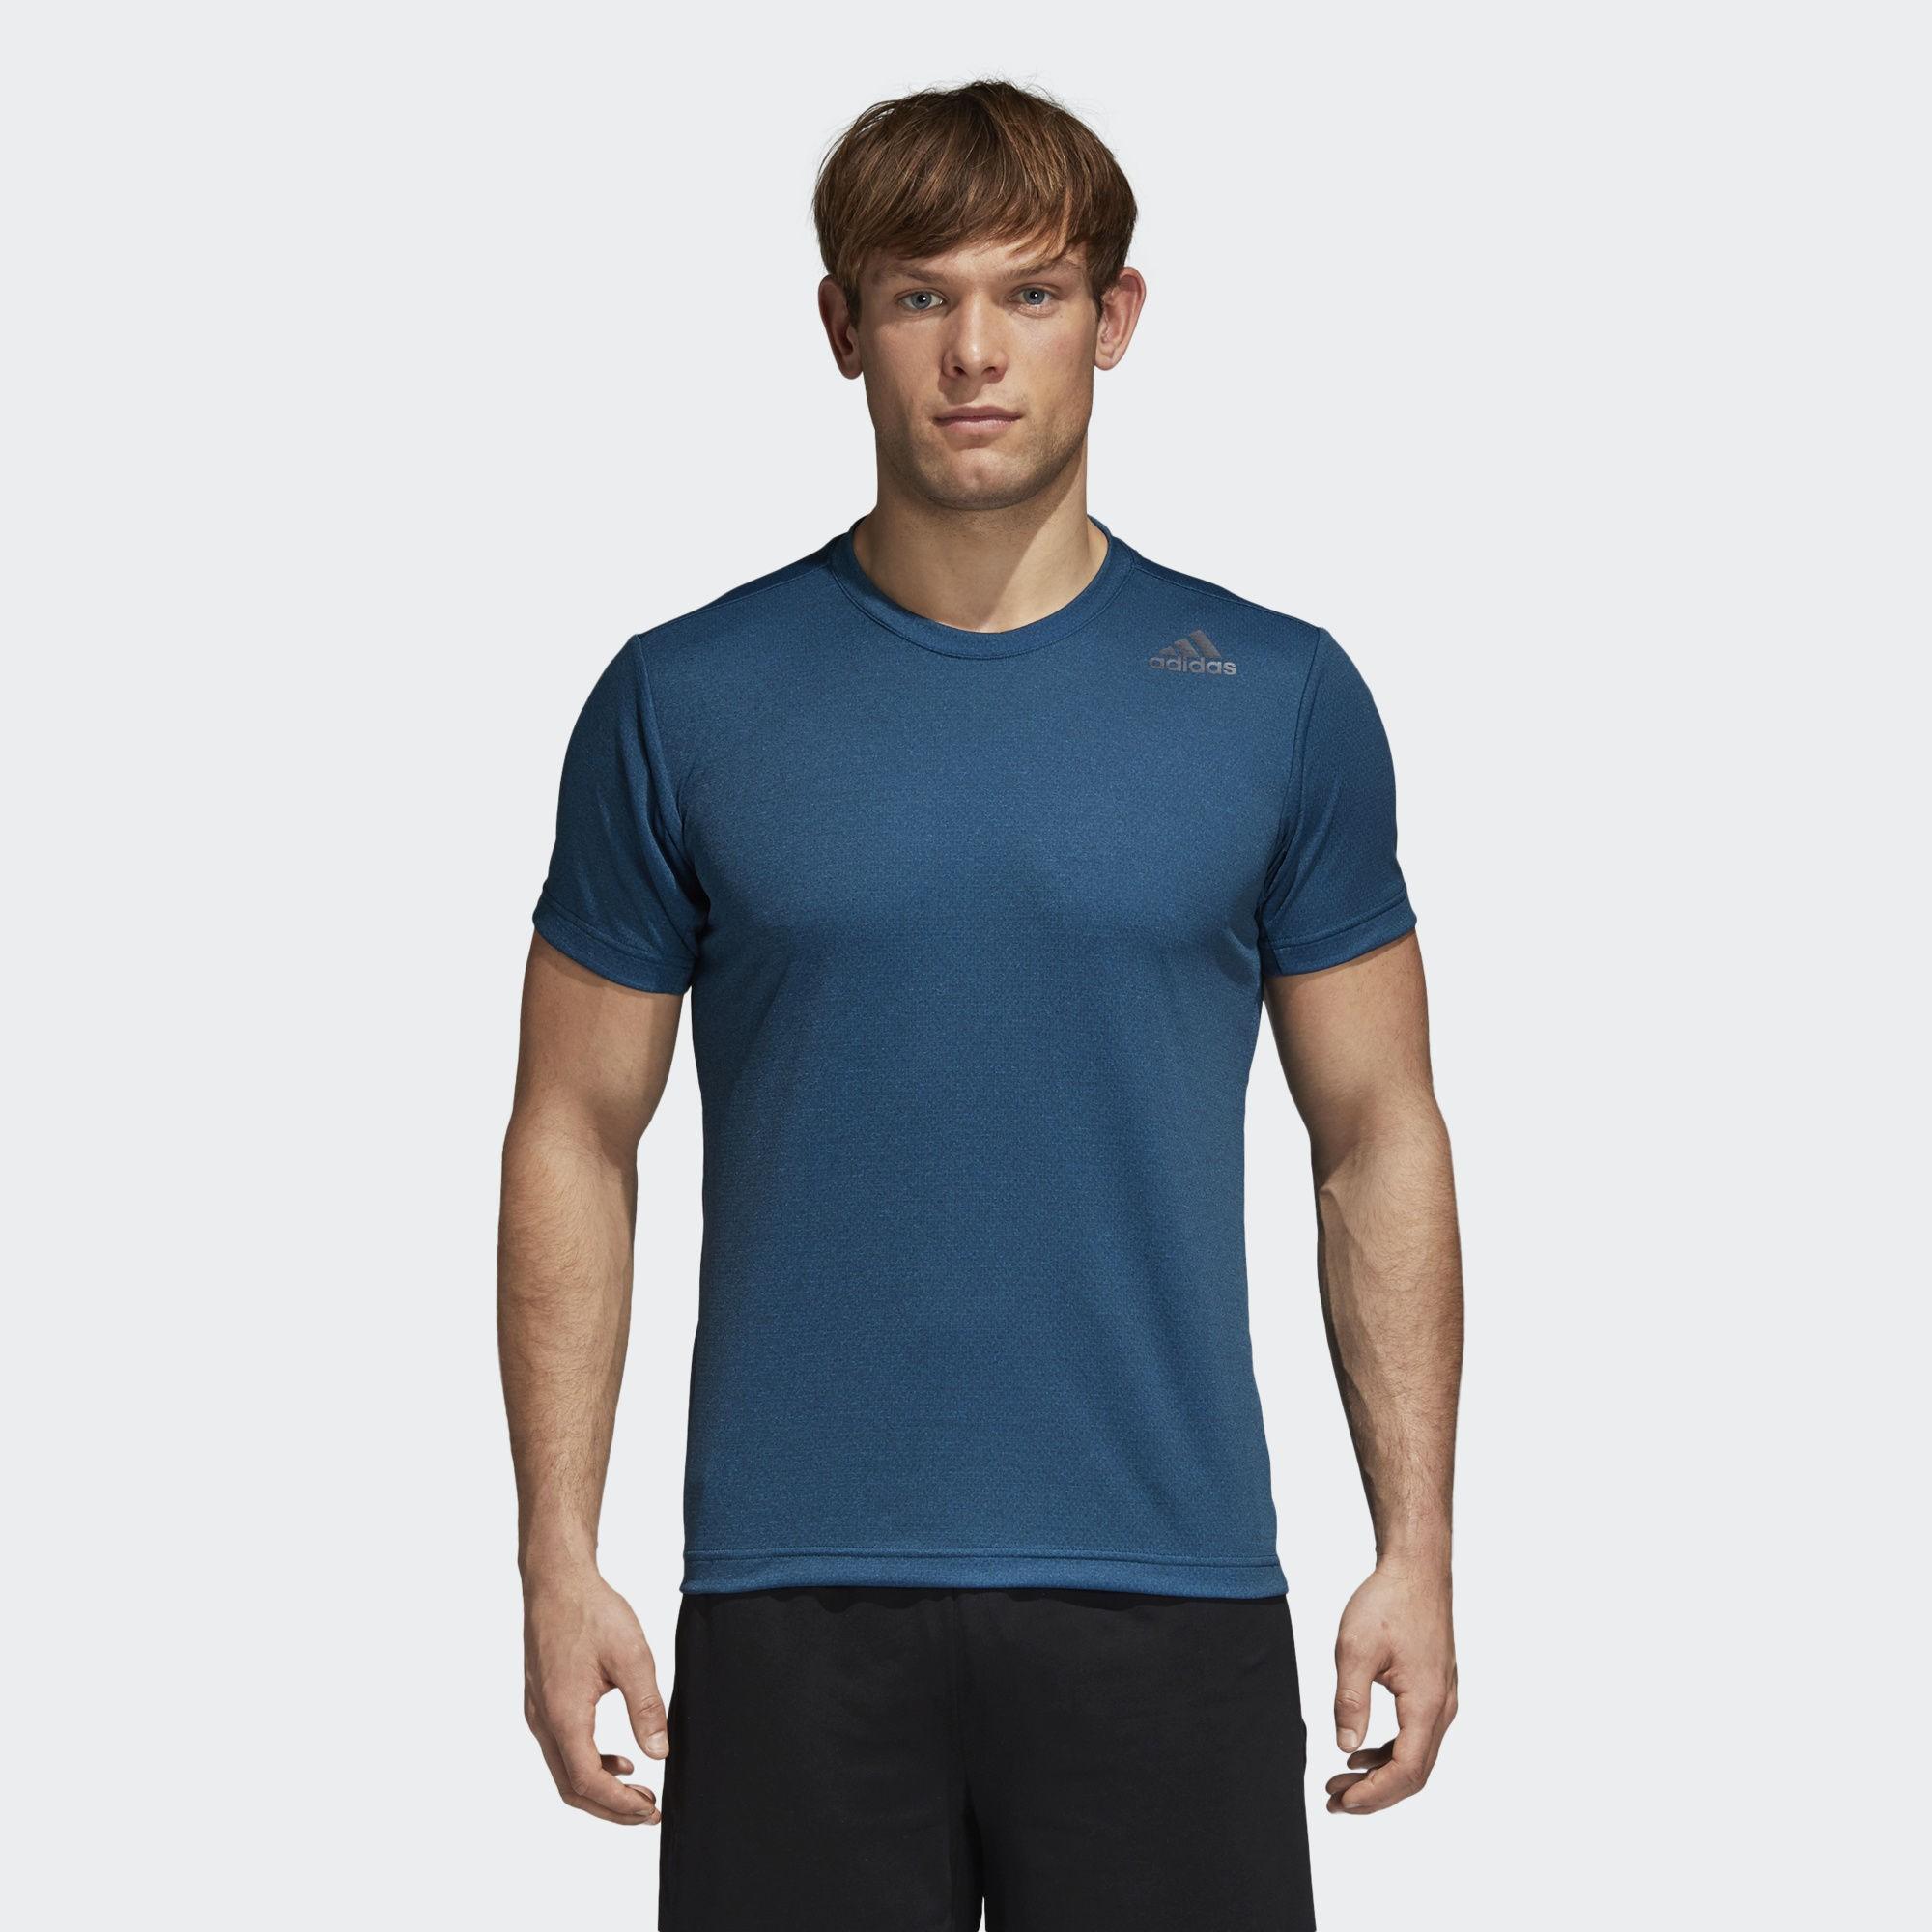 Cz9046 Freelift Manzanedo Deportes Camiseta Adidas Cl 7Aw1Oq